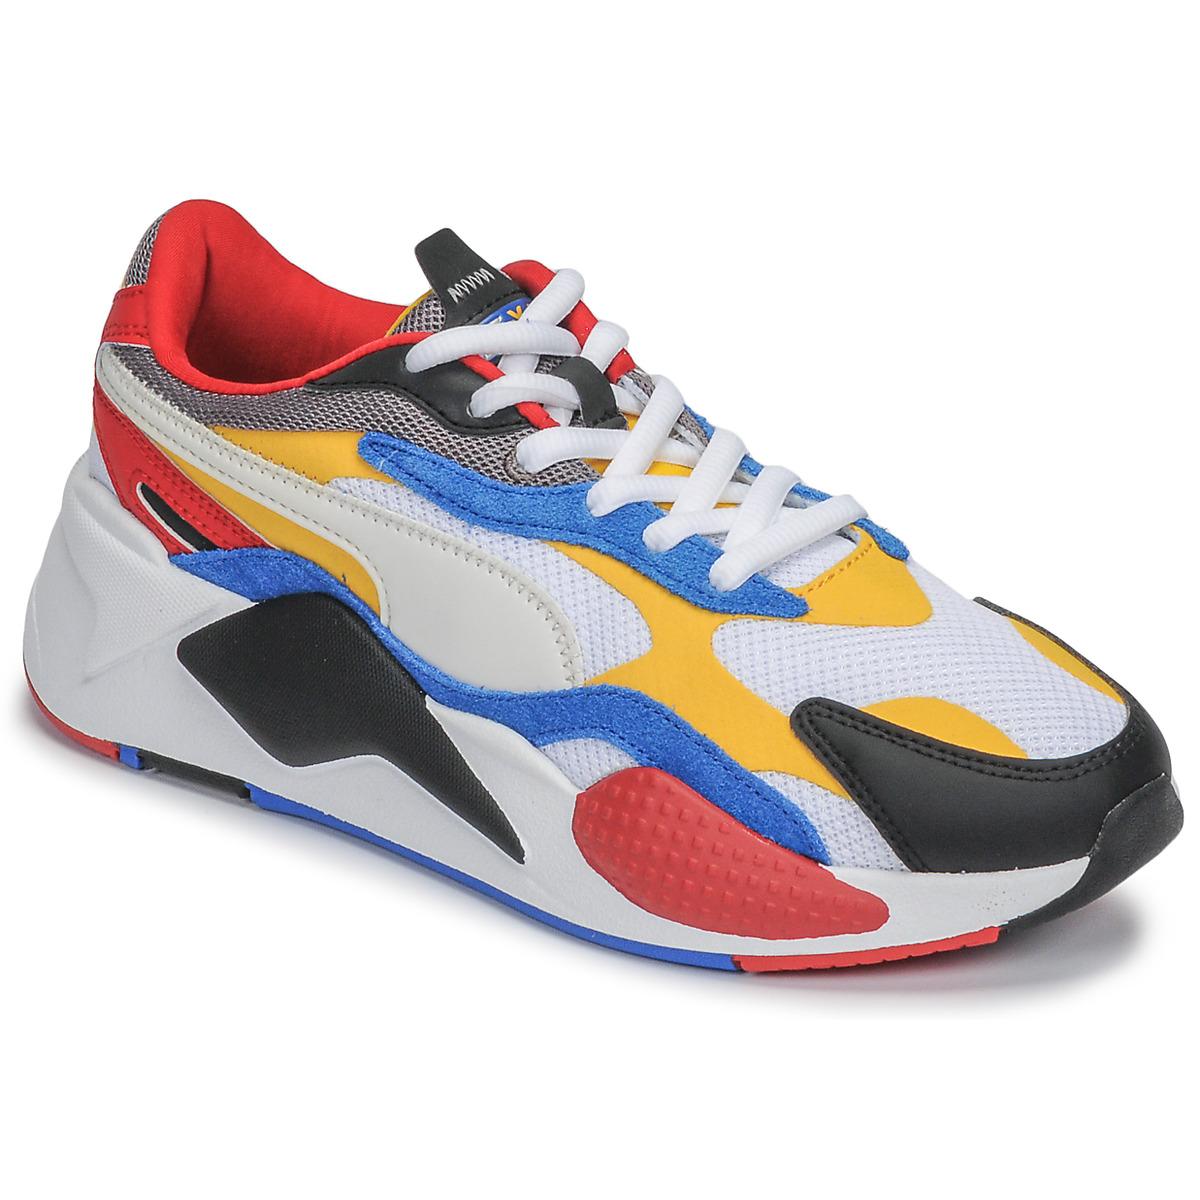 Barra oblicua Coche Explicación  Puma RS-X3 Multicolour - Fast delivery | Spartoo Europe ! - Shoes ...